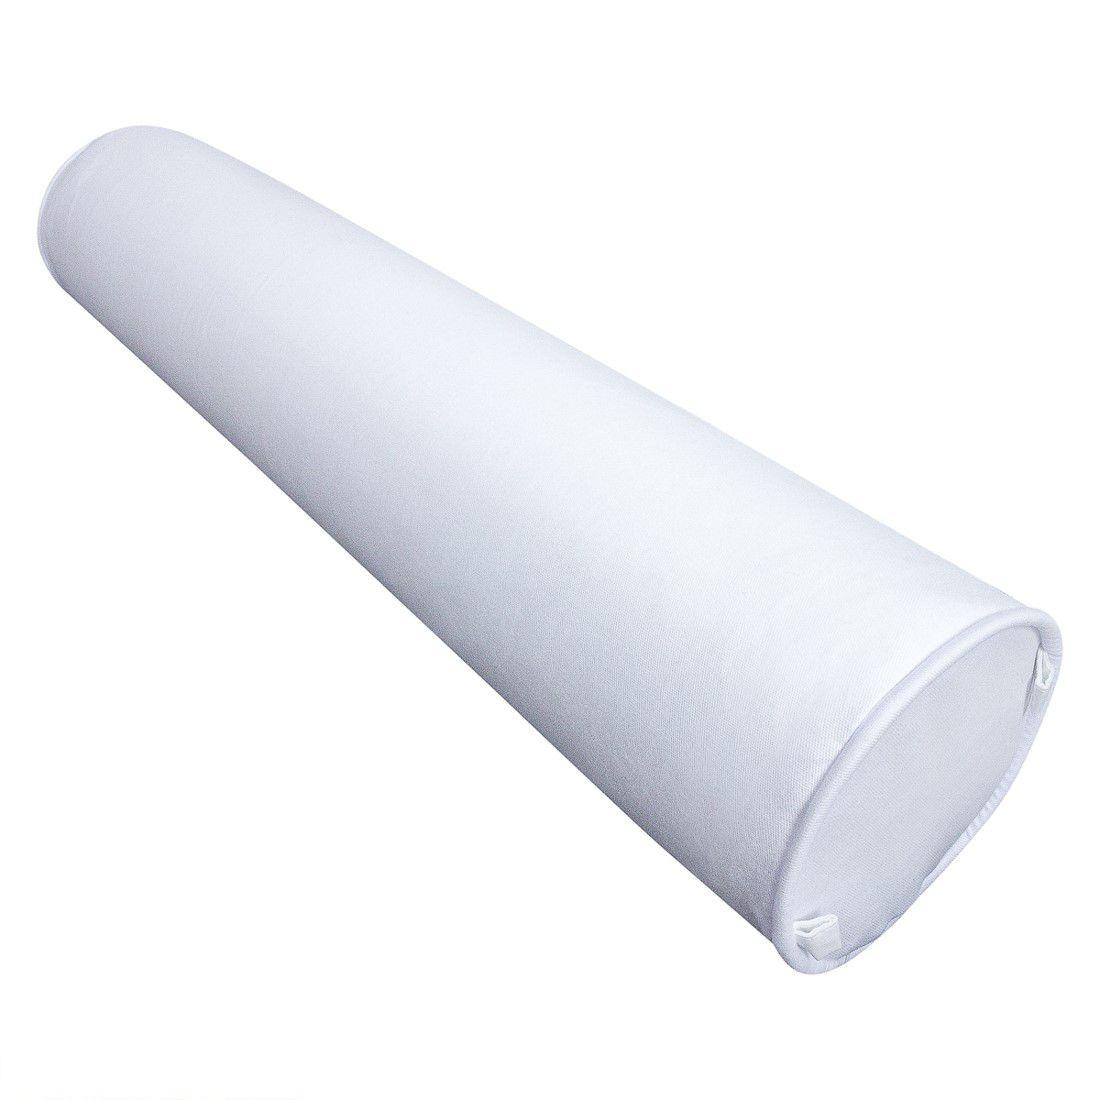 Rolo 60cm branco